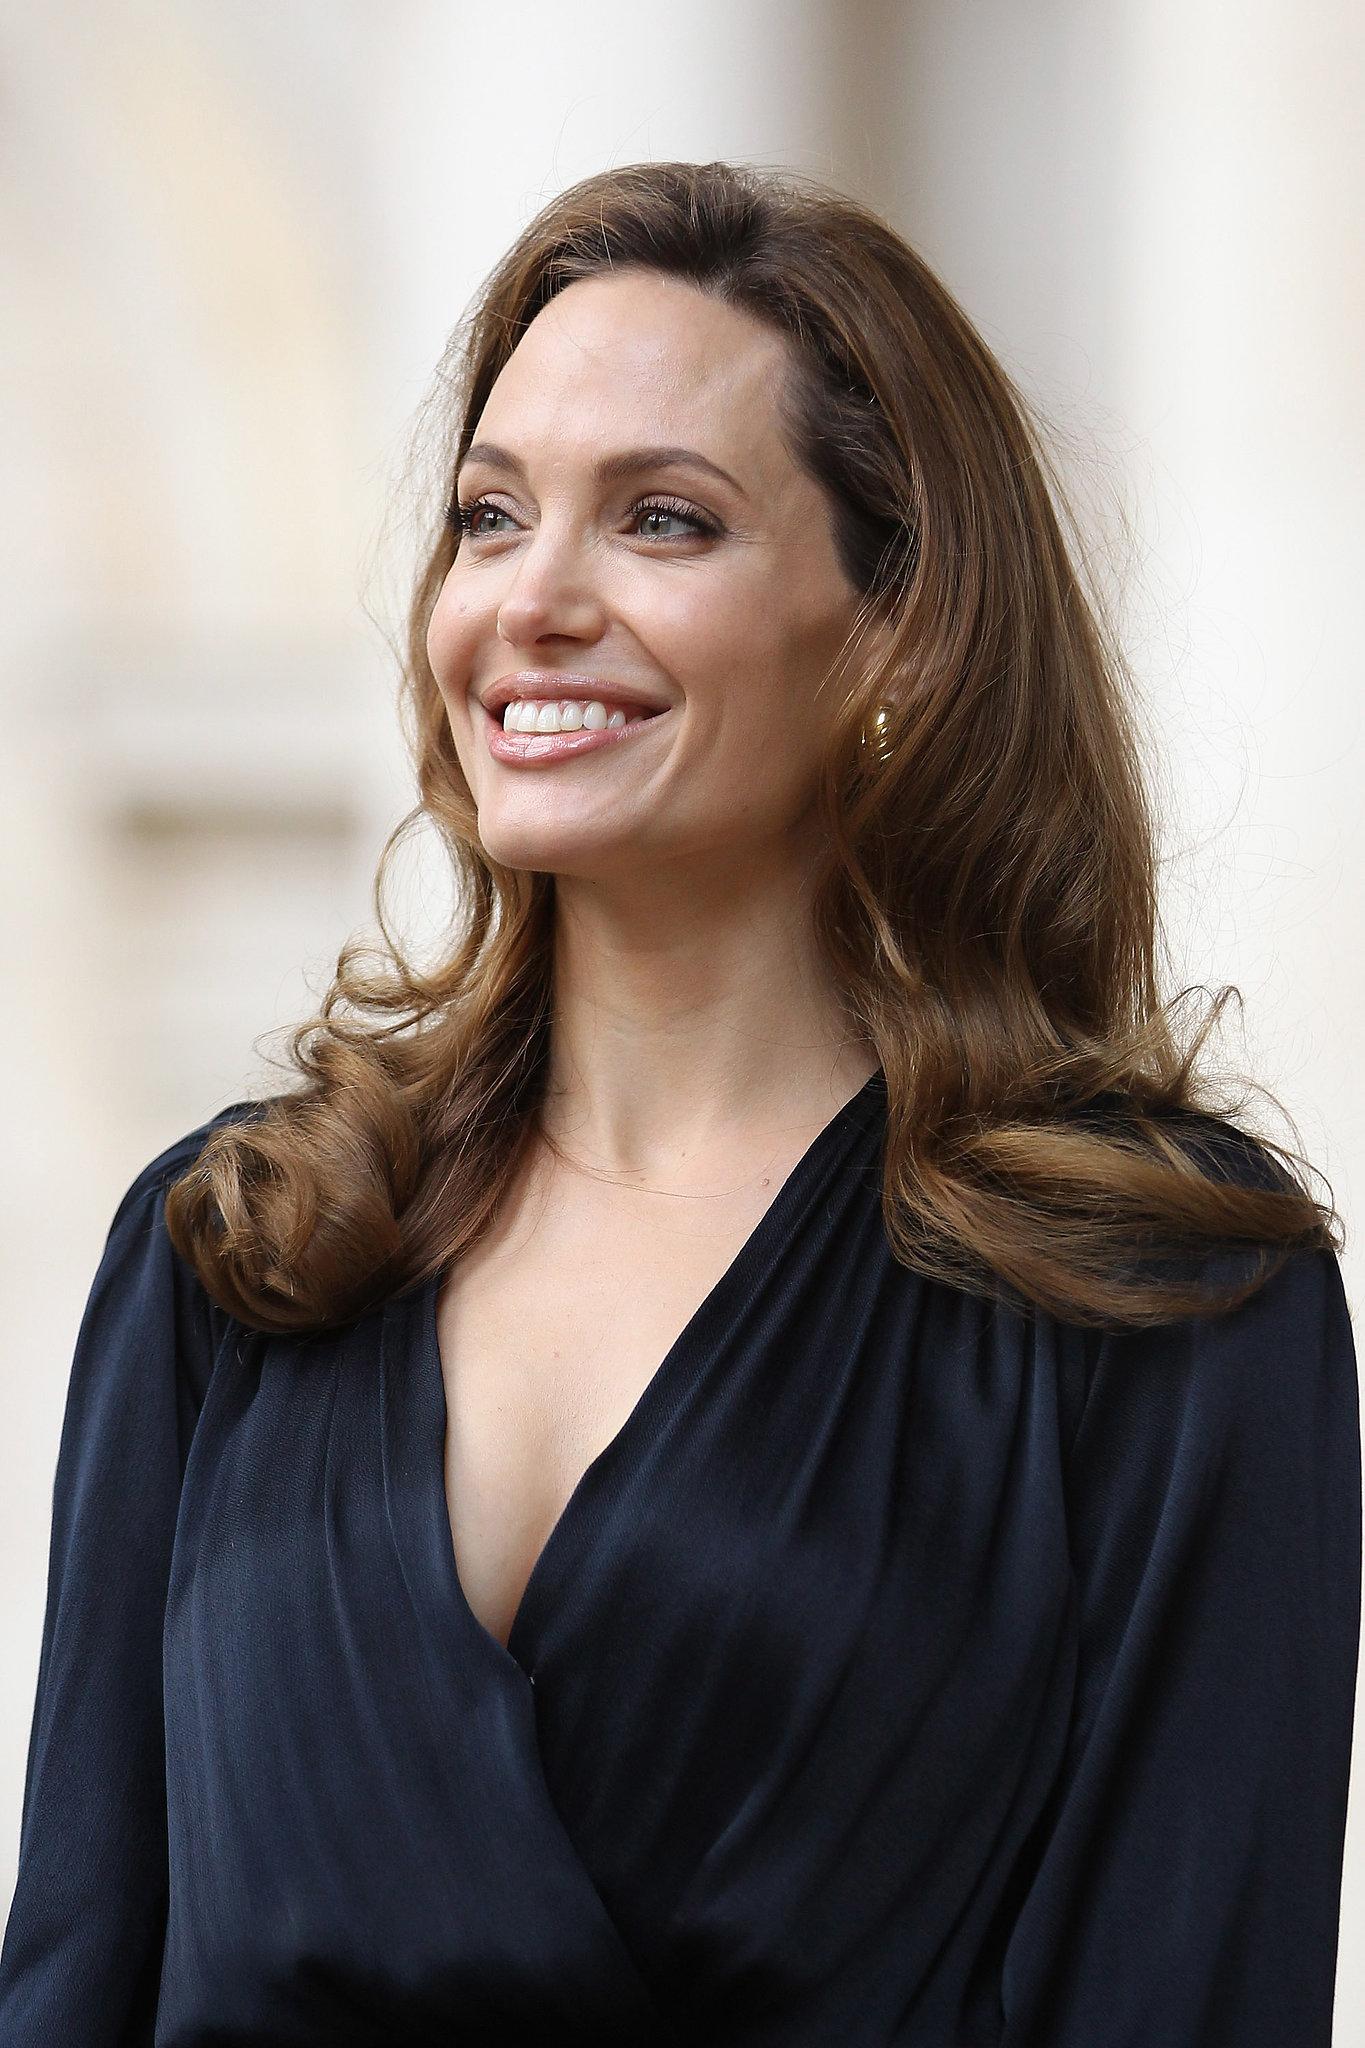 Angelina Inspires With Honest Op-Ed